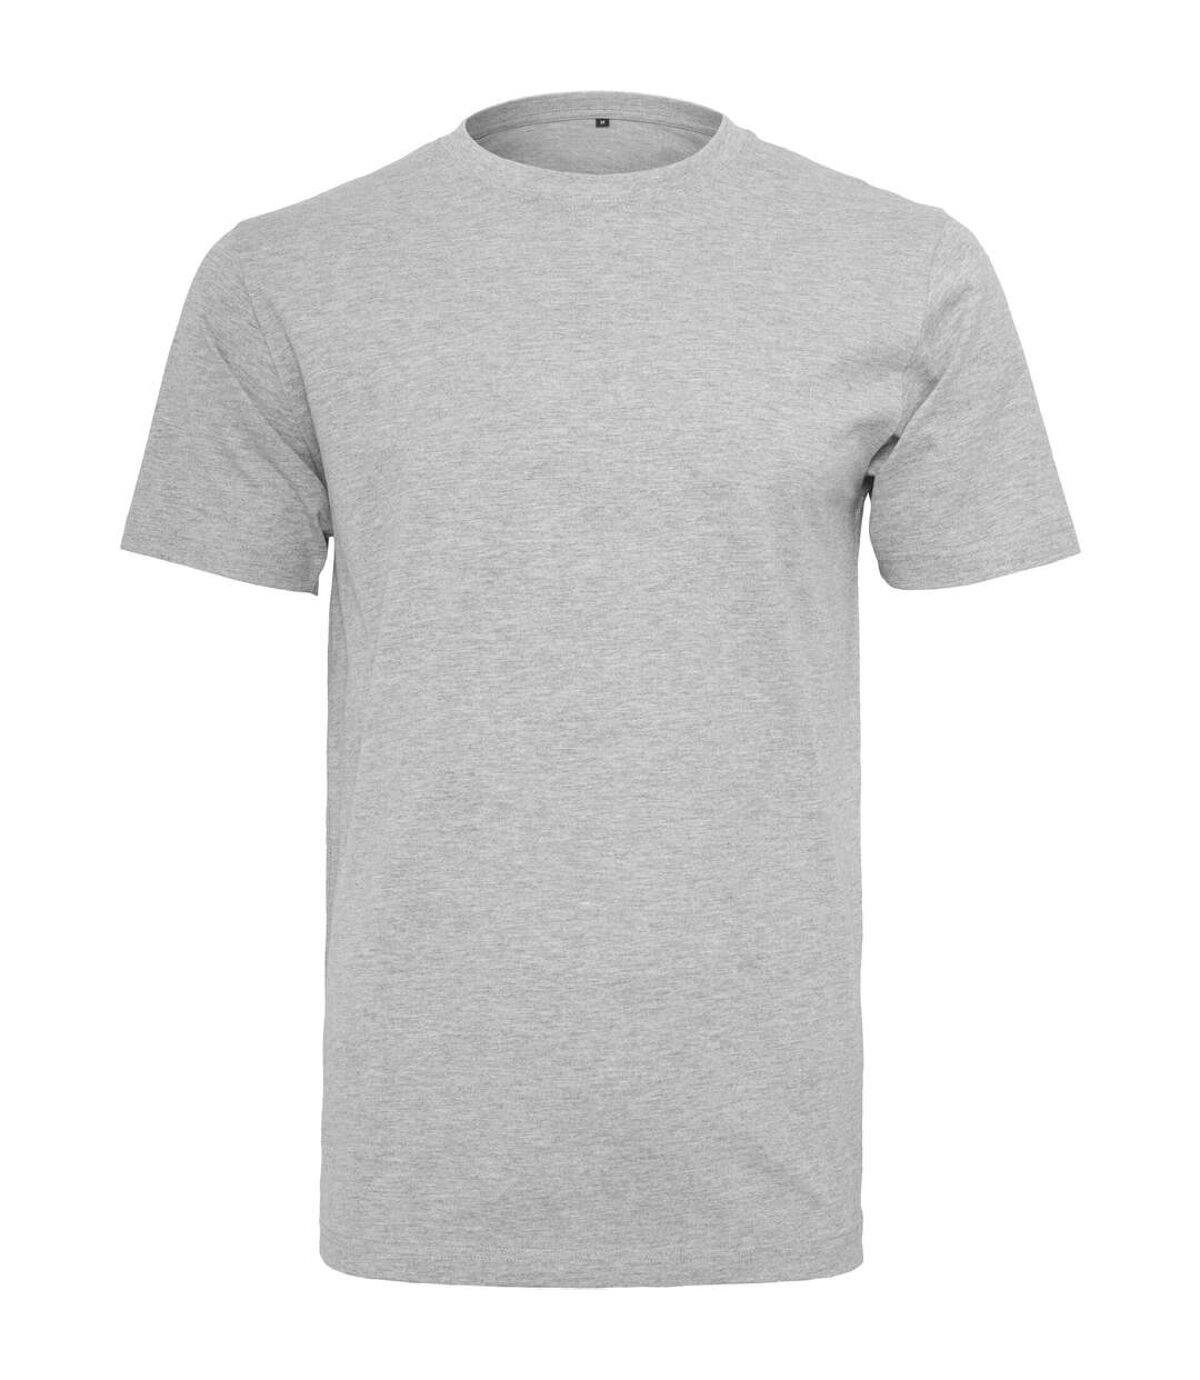 Build Your Brand Mens T-Shirt Round Neck (Heather Grey) - UTRW5815